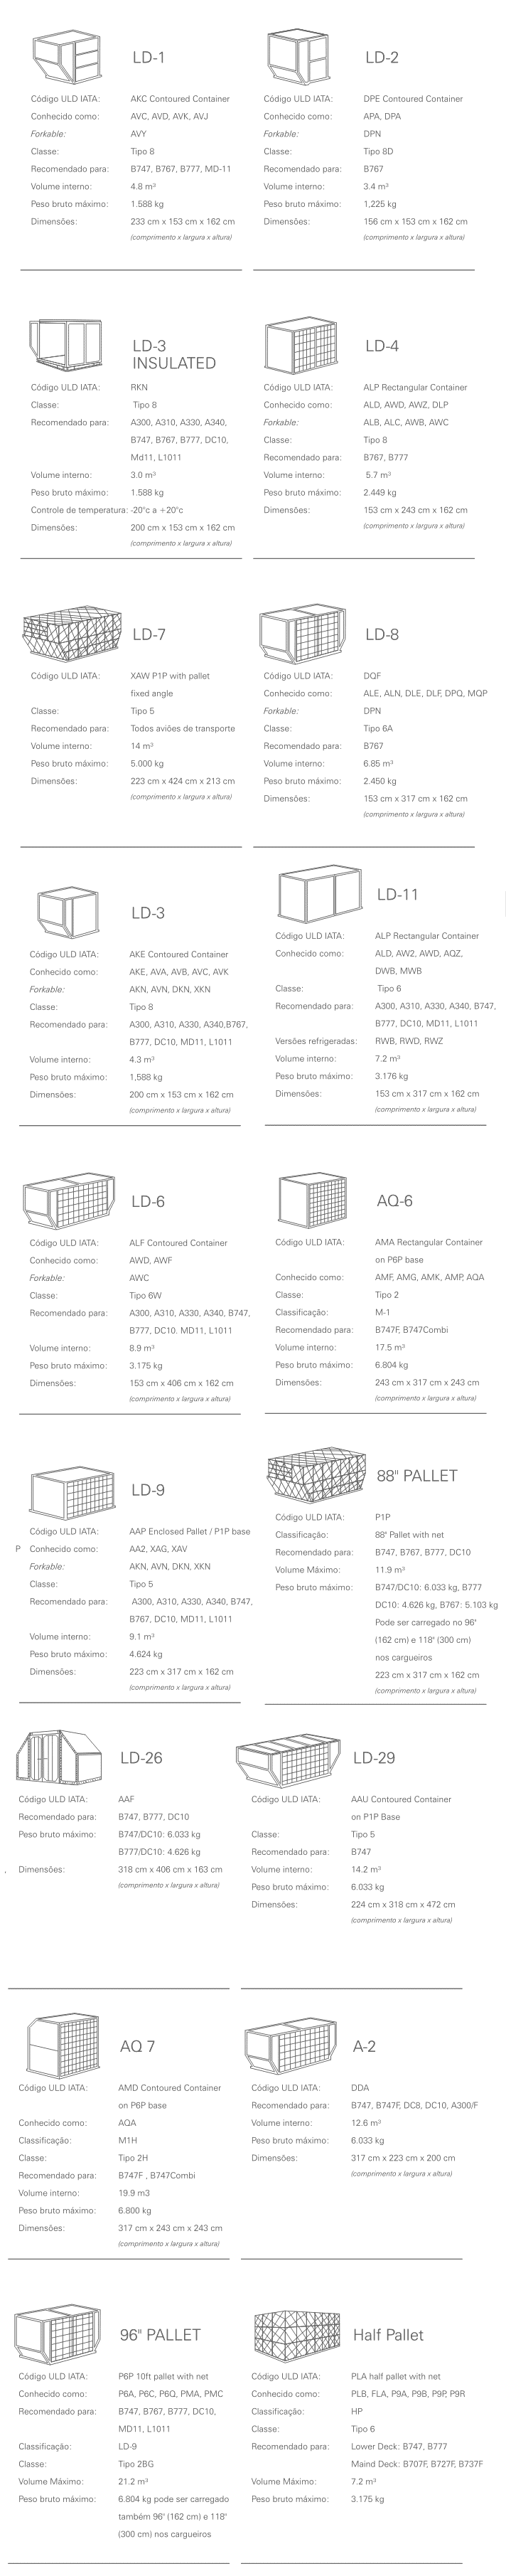 conteineres-pallets-aereosb